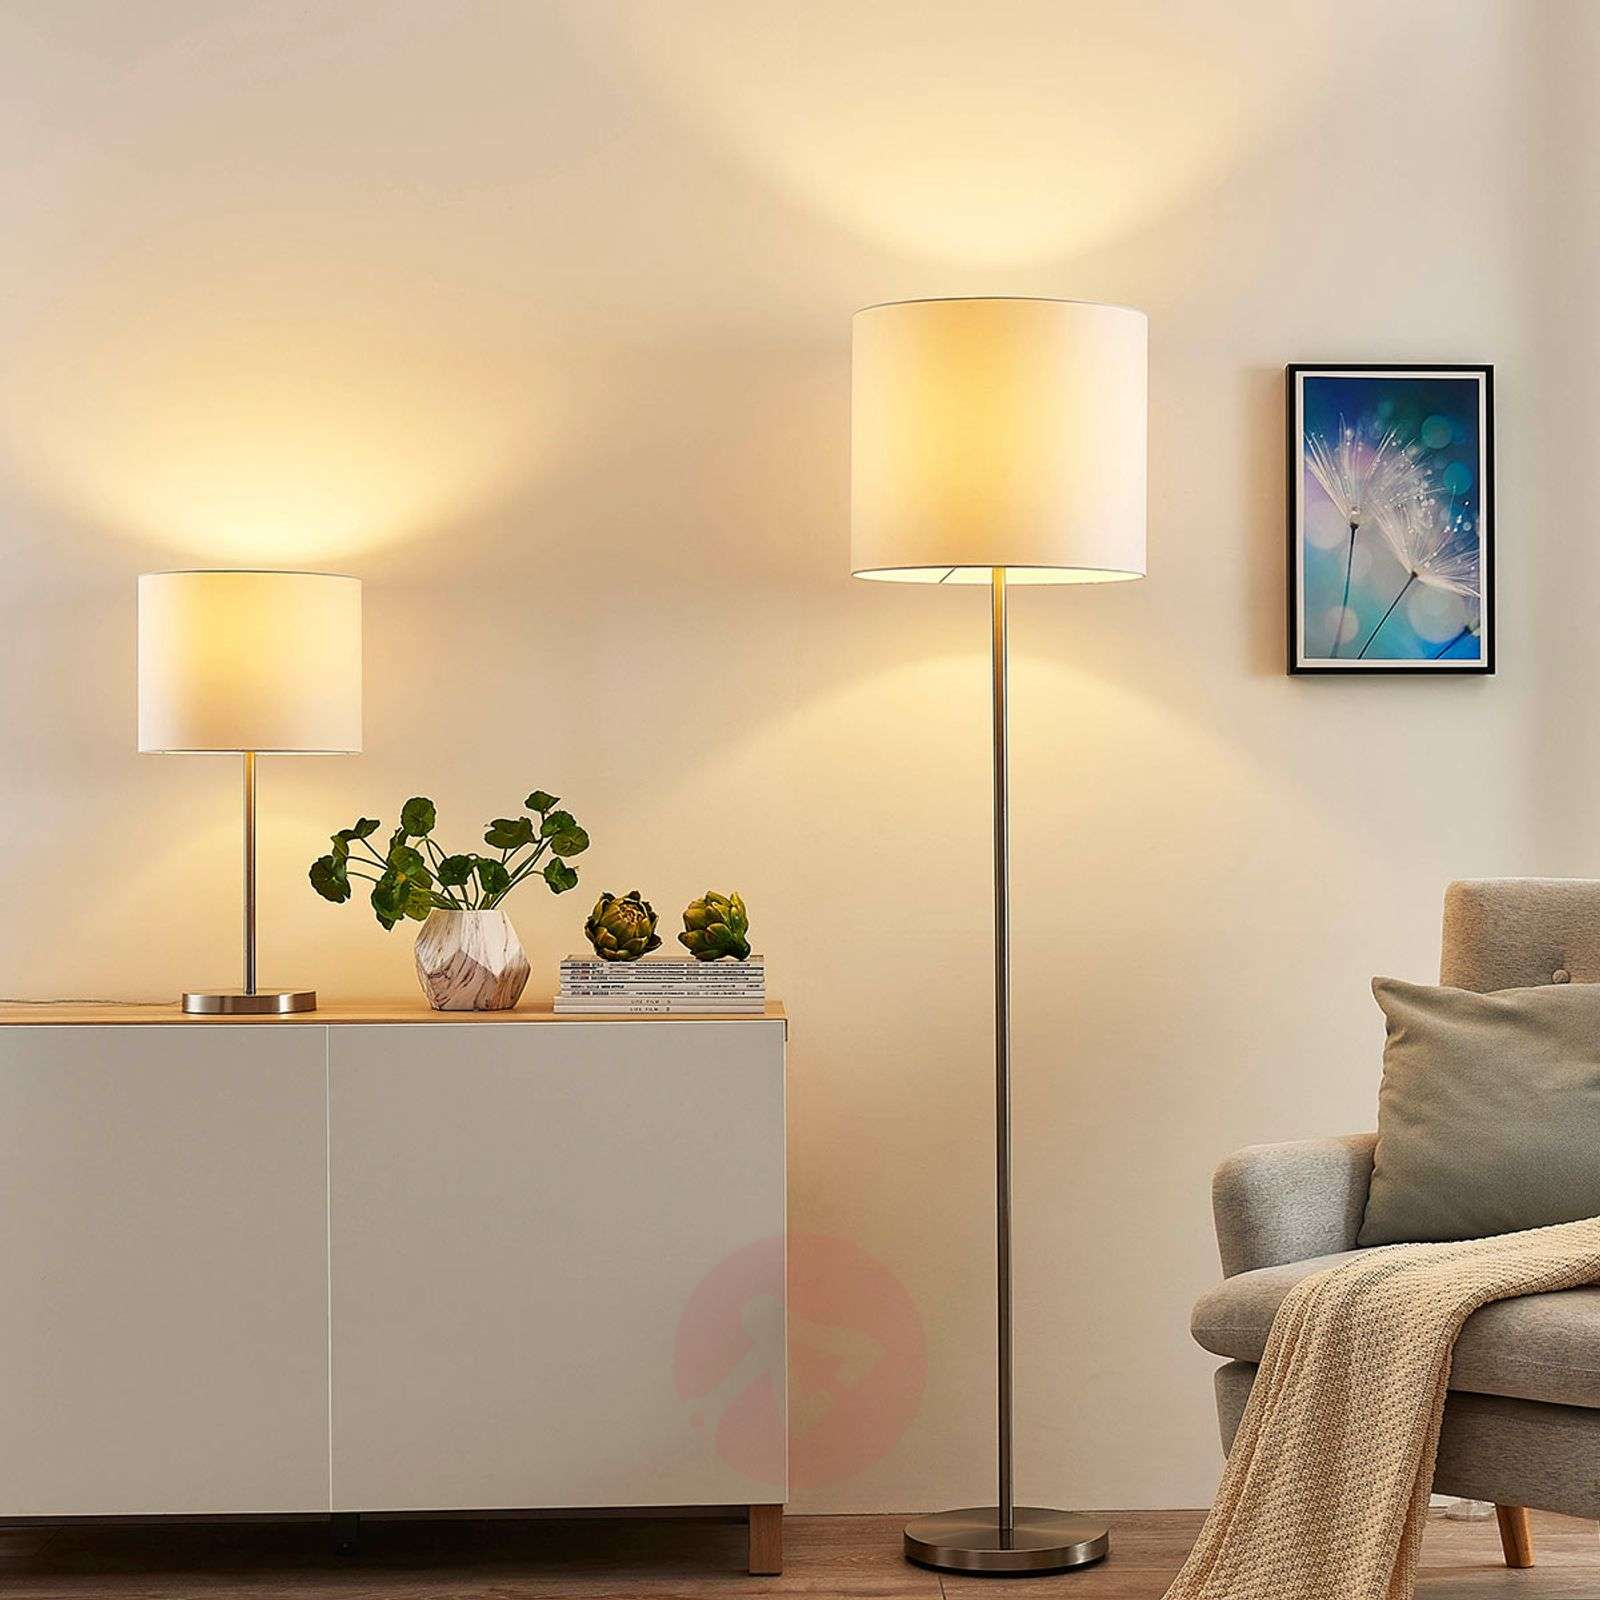 Lindby Smart LED-lattiavalaisin Everly app, RGB-9624101-01